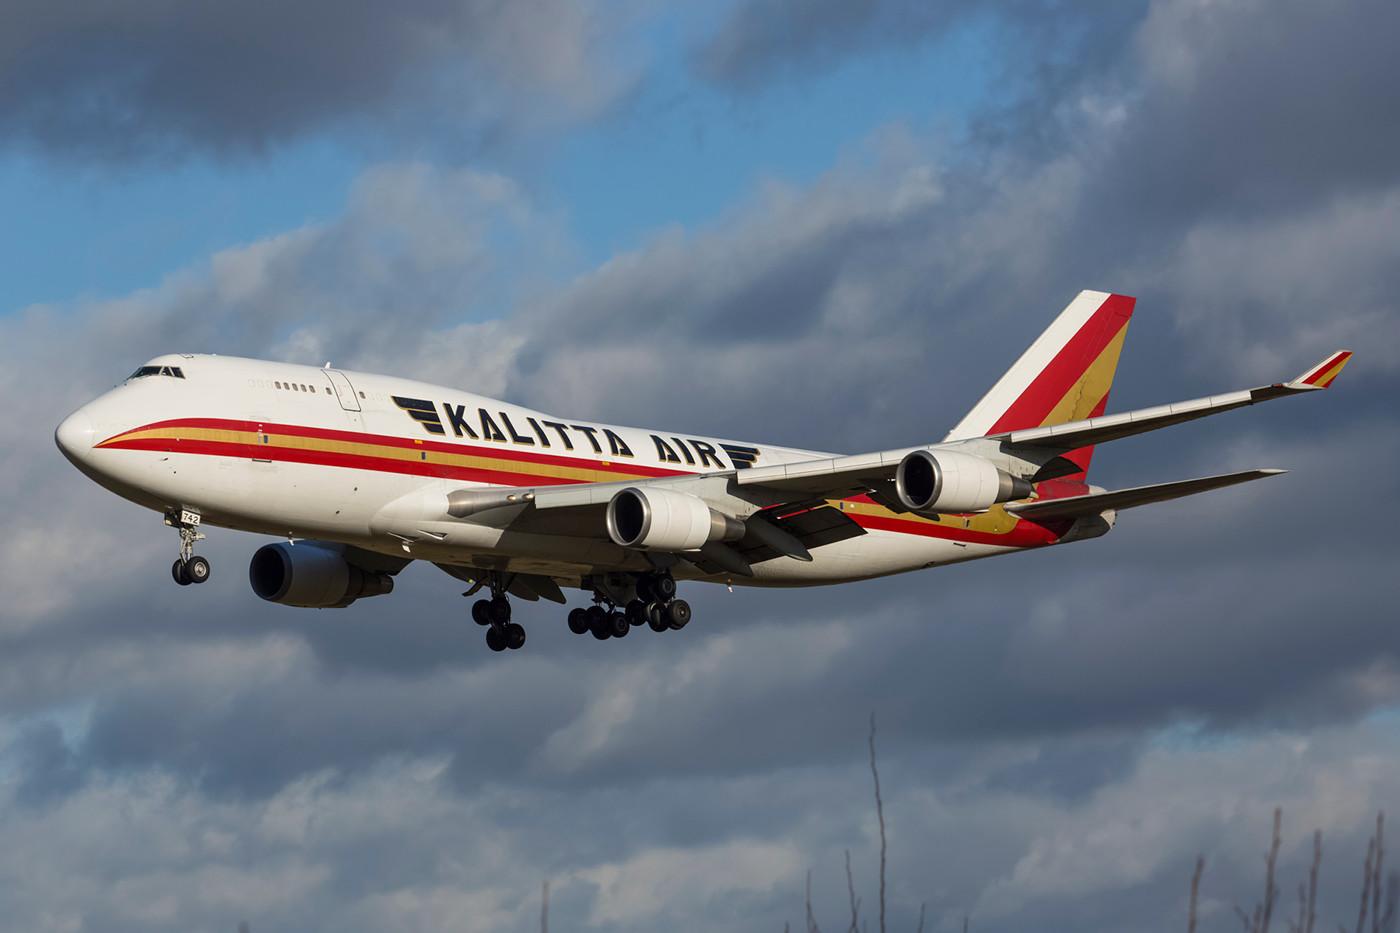 RMS 11.01.2015; Boeing 747-446BCF; Kalitta Air (ex-Japan Airlines JA8072)